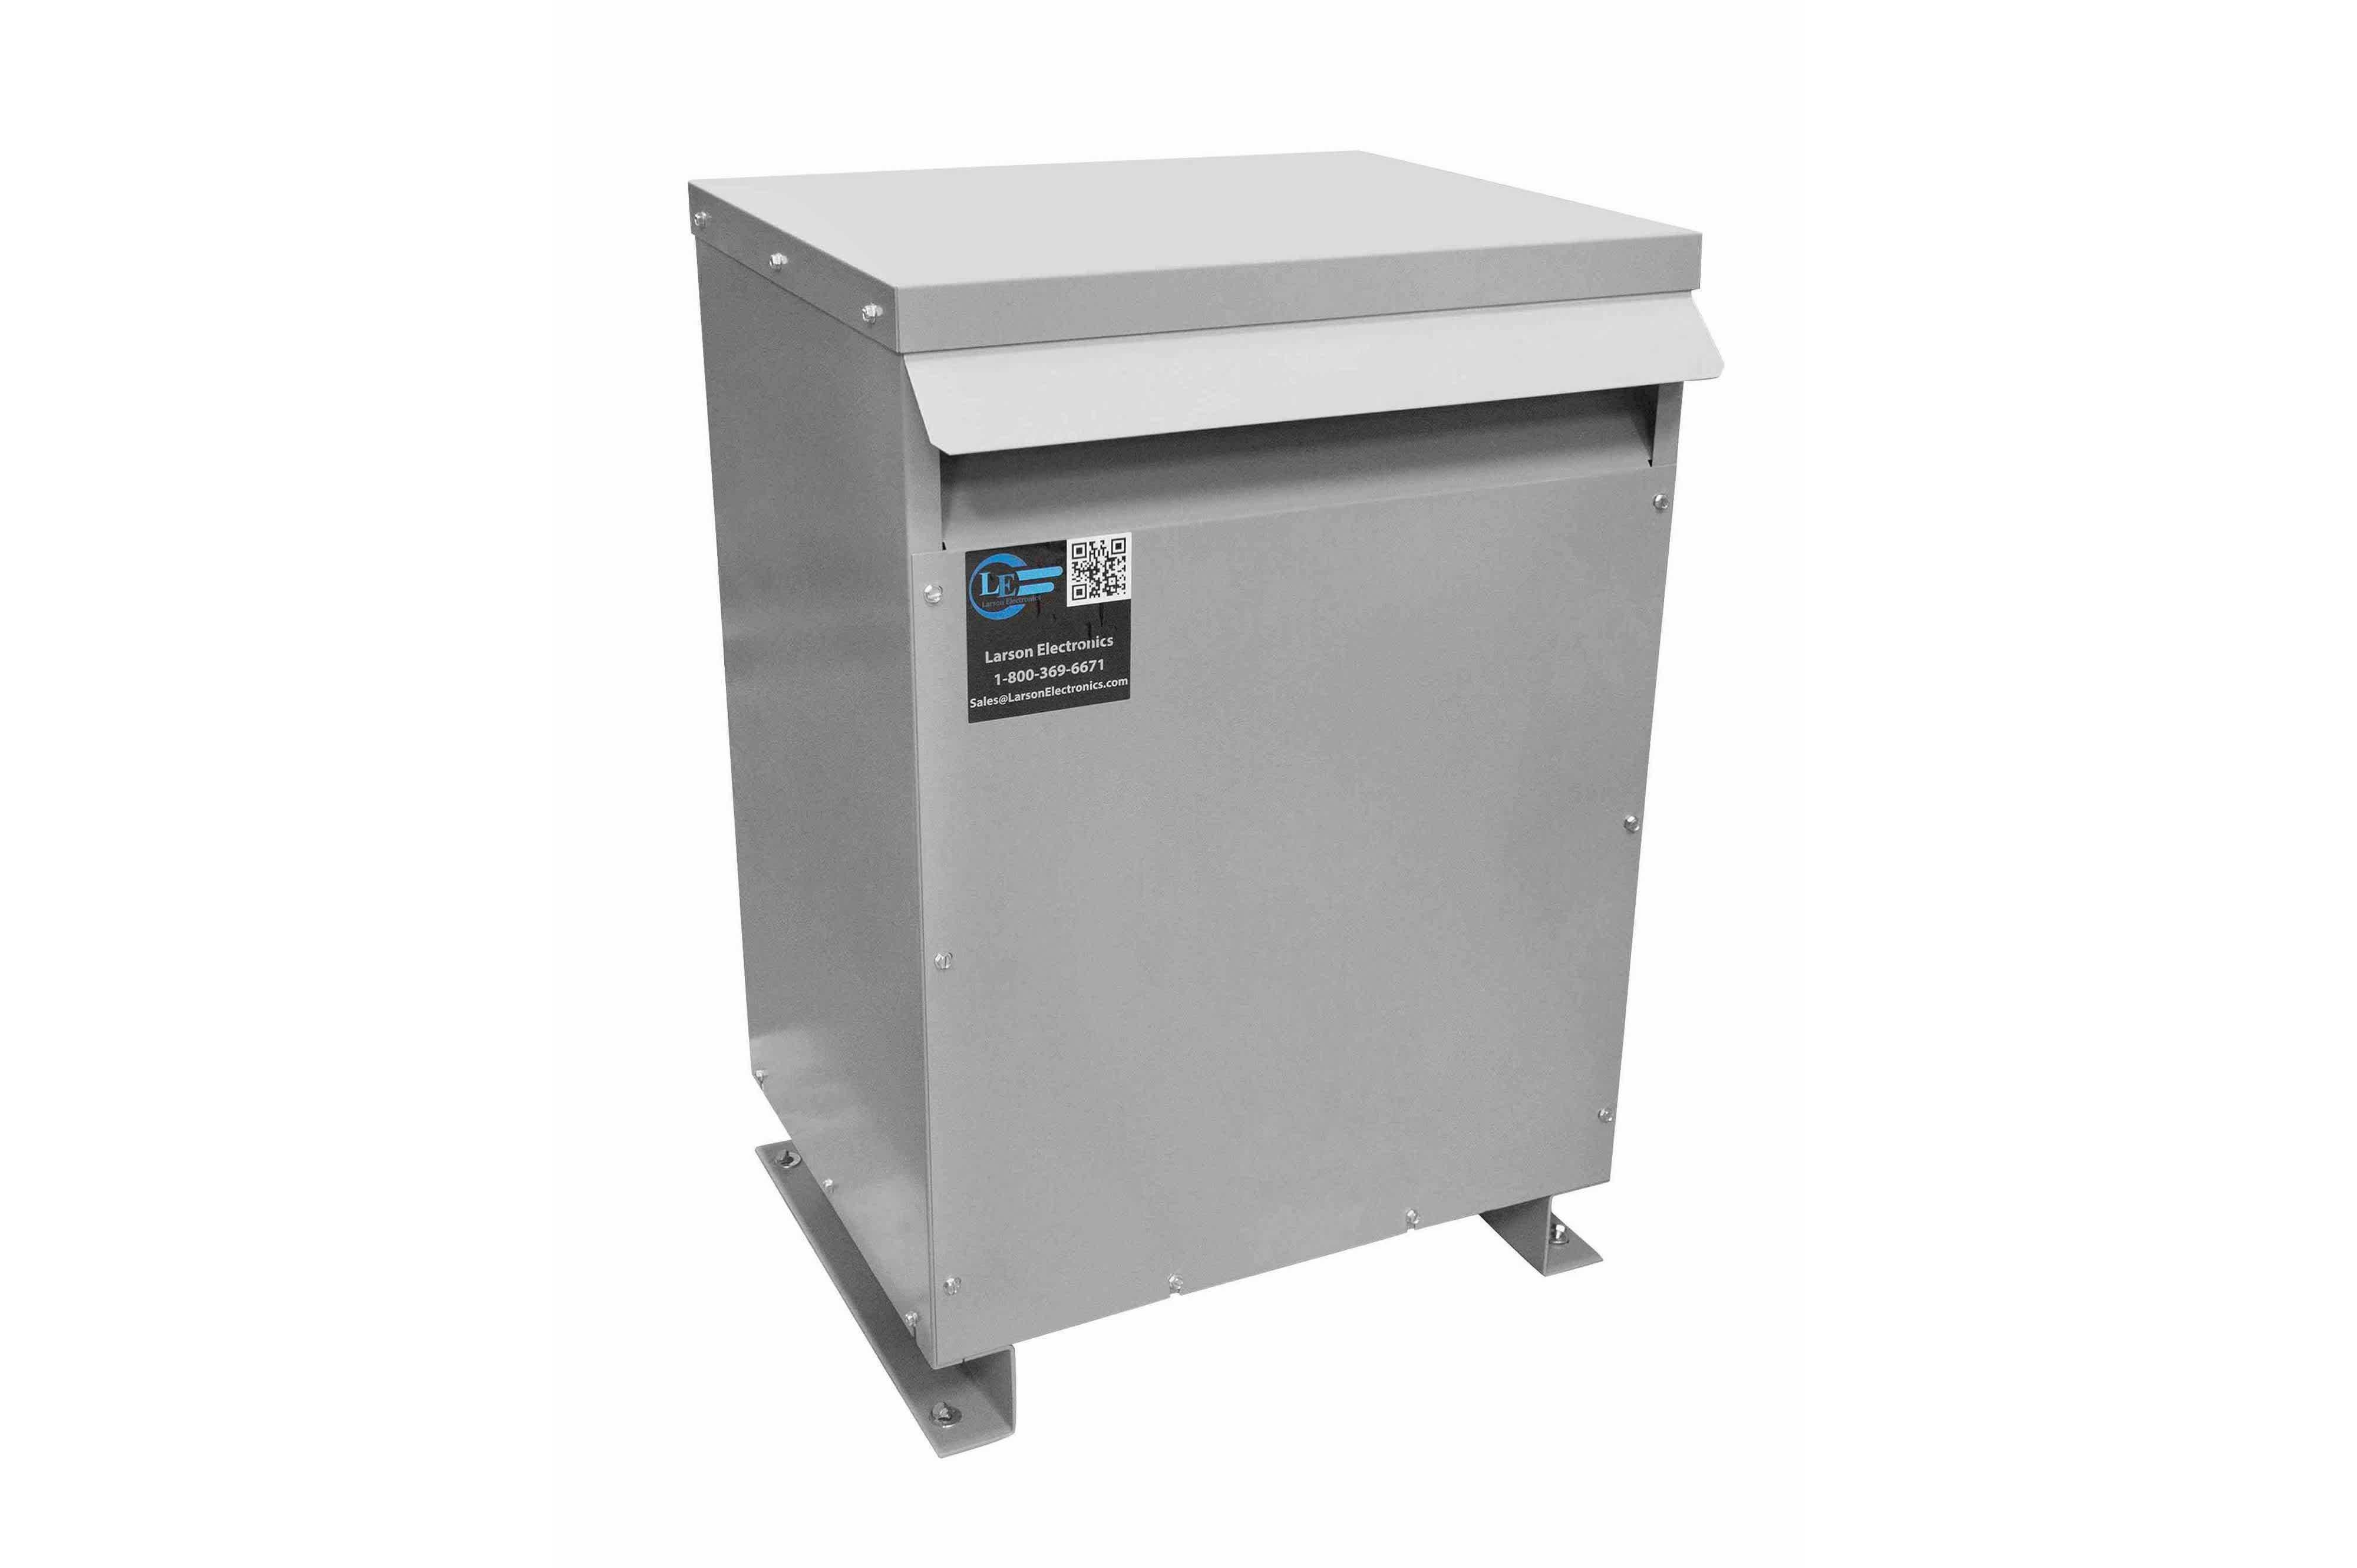 27 kVA 3PH Isolation Transformer, 460V Wye Primary, 600Y/347 Wye-N Secondary, N3R, Ventilated, 60 Hz